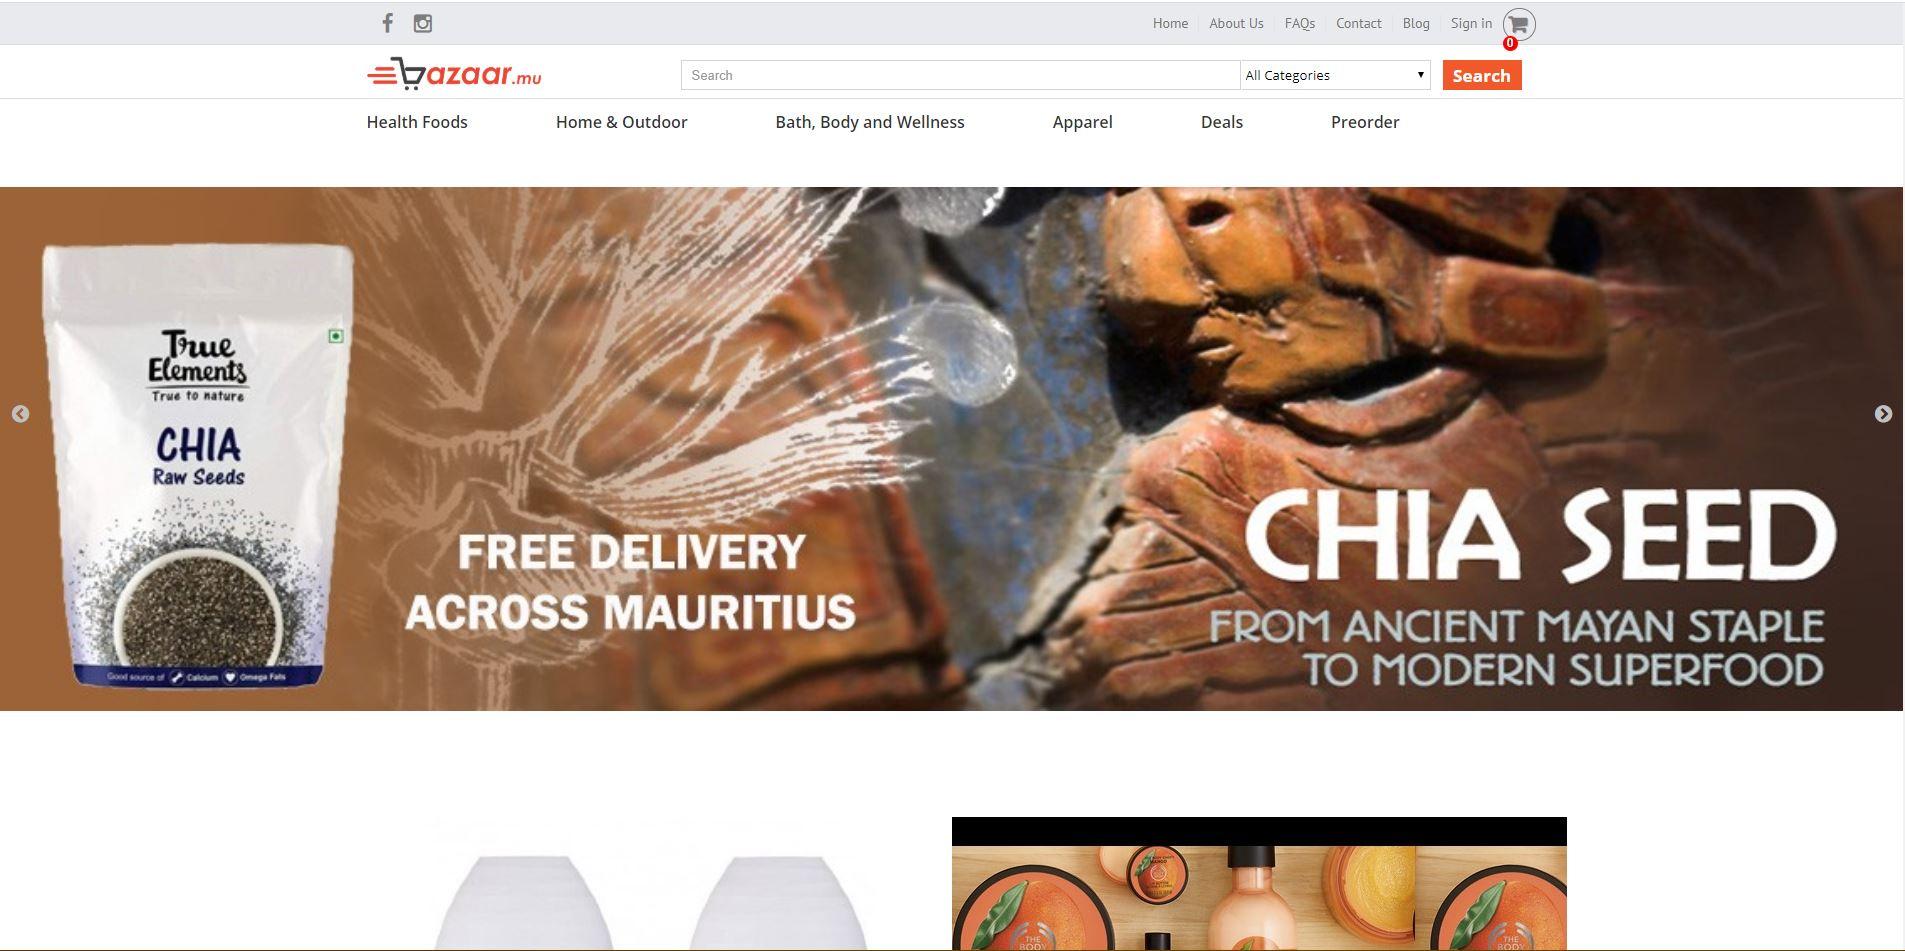 Bazaar-mu-digital-marketing-mauritius-ecommerce